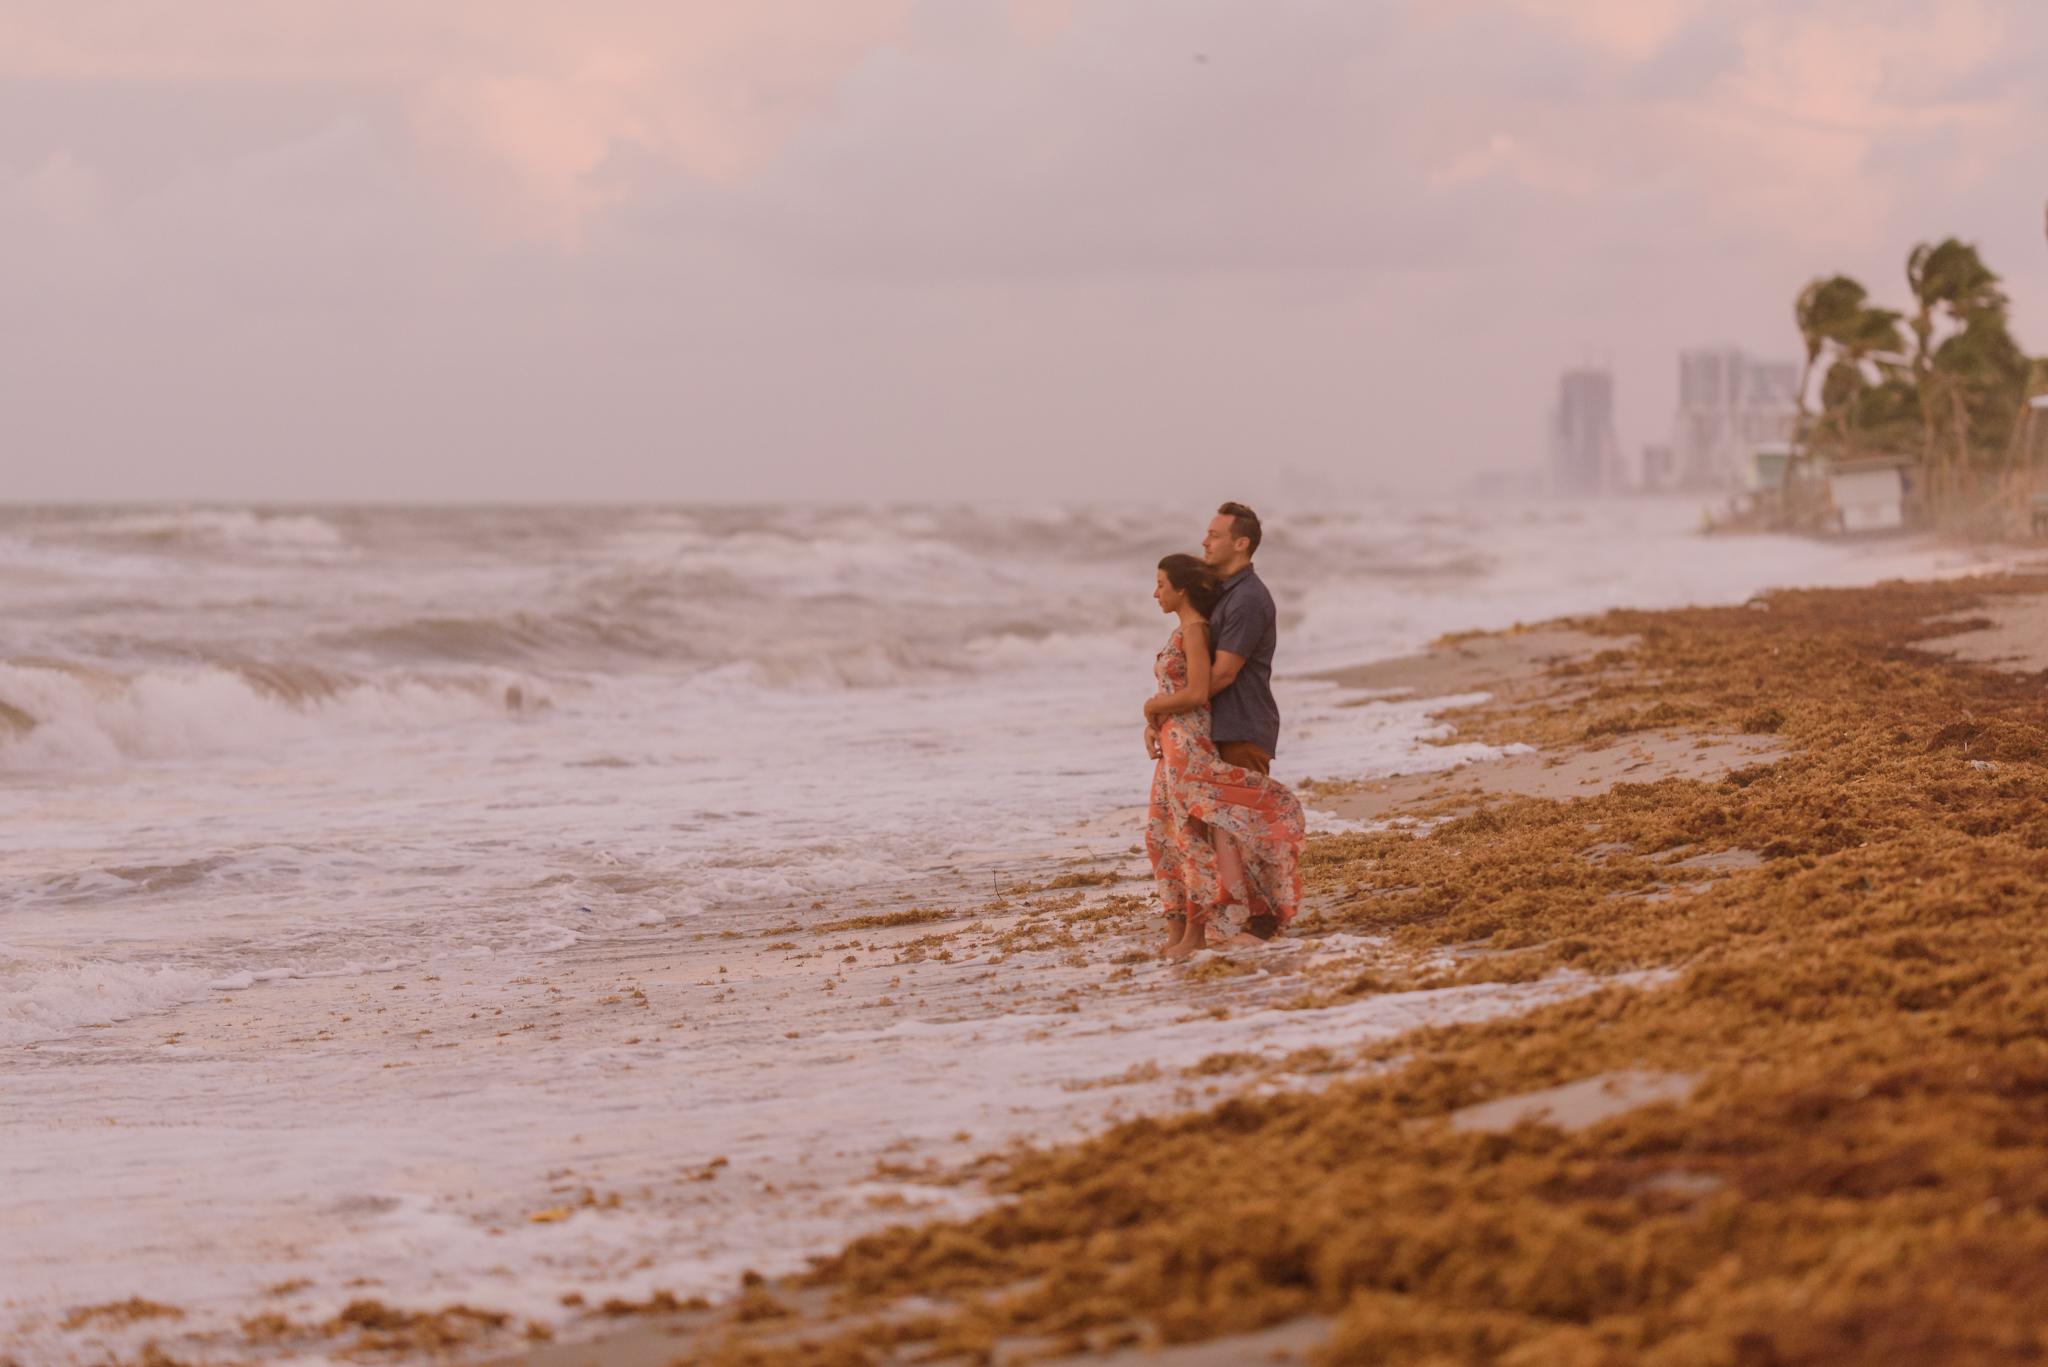 florida-beach-engagement-vanessa-and-johnny-photography-video-1-5.jpg